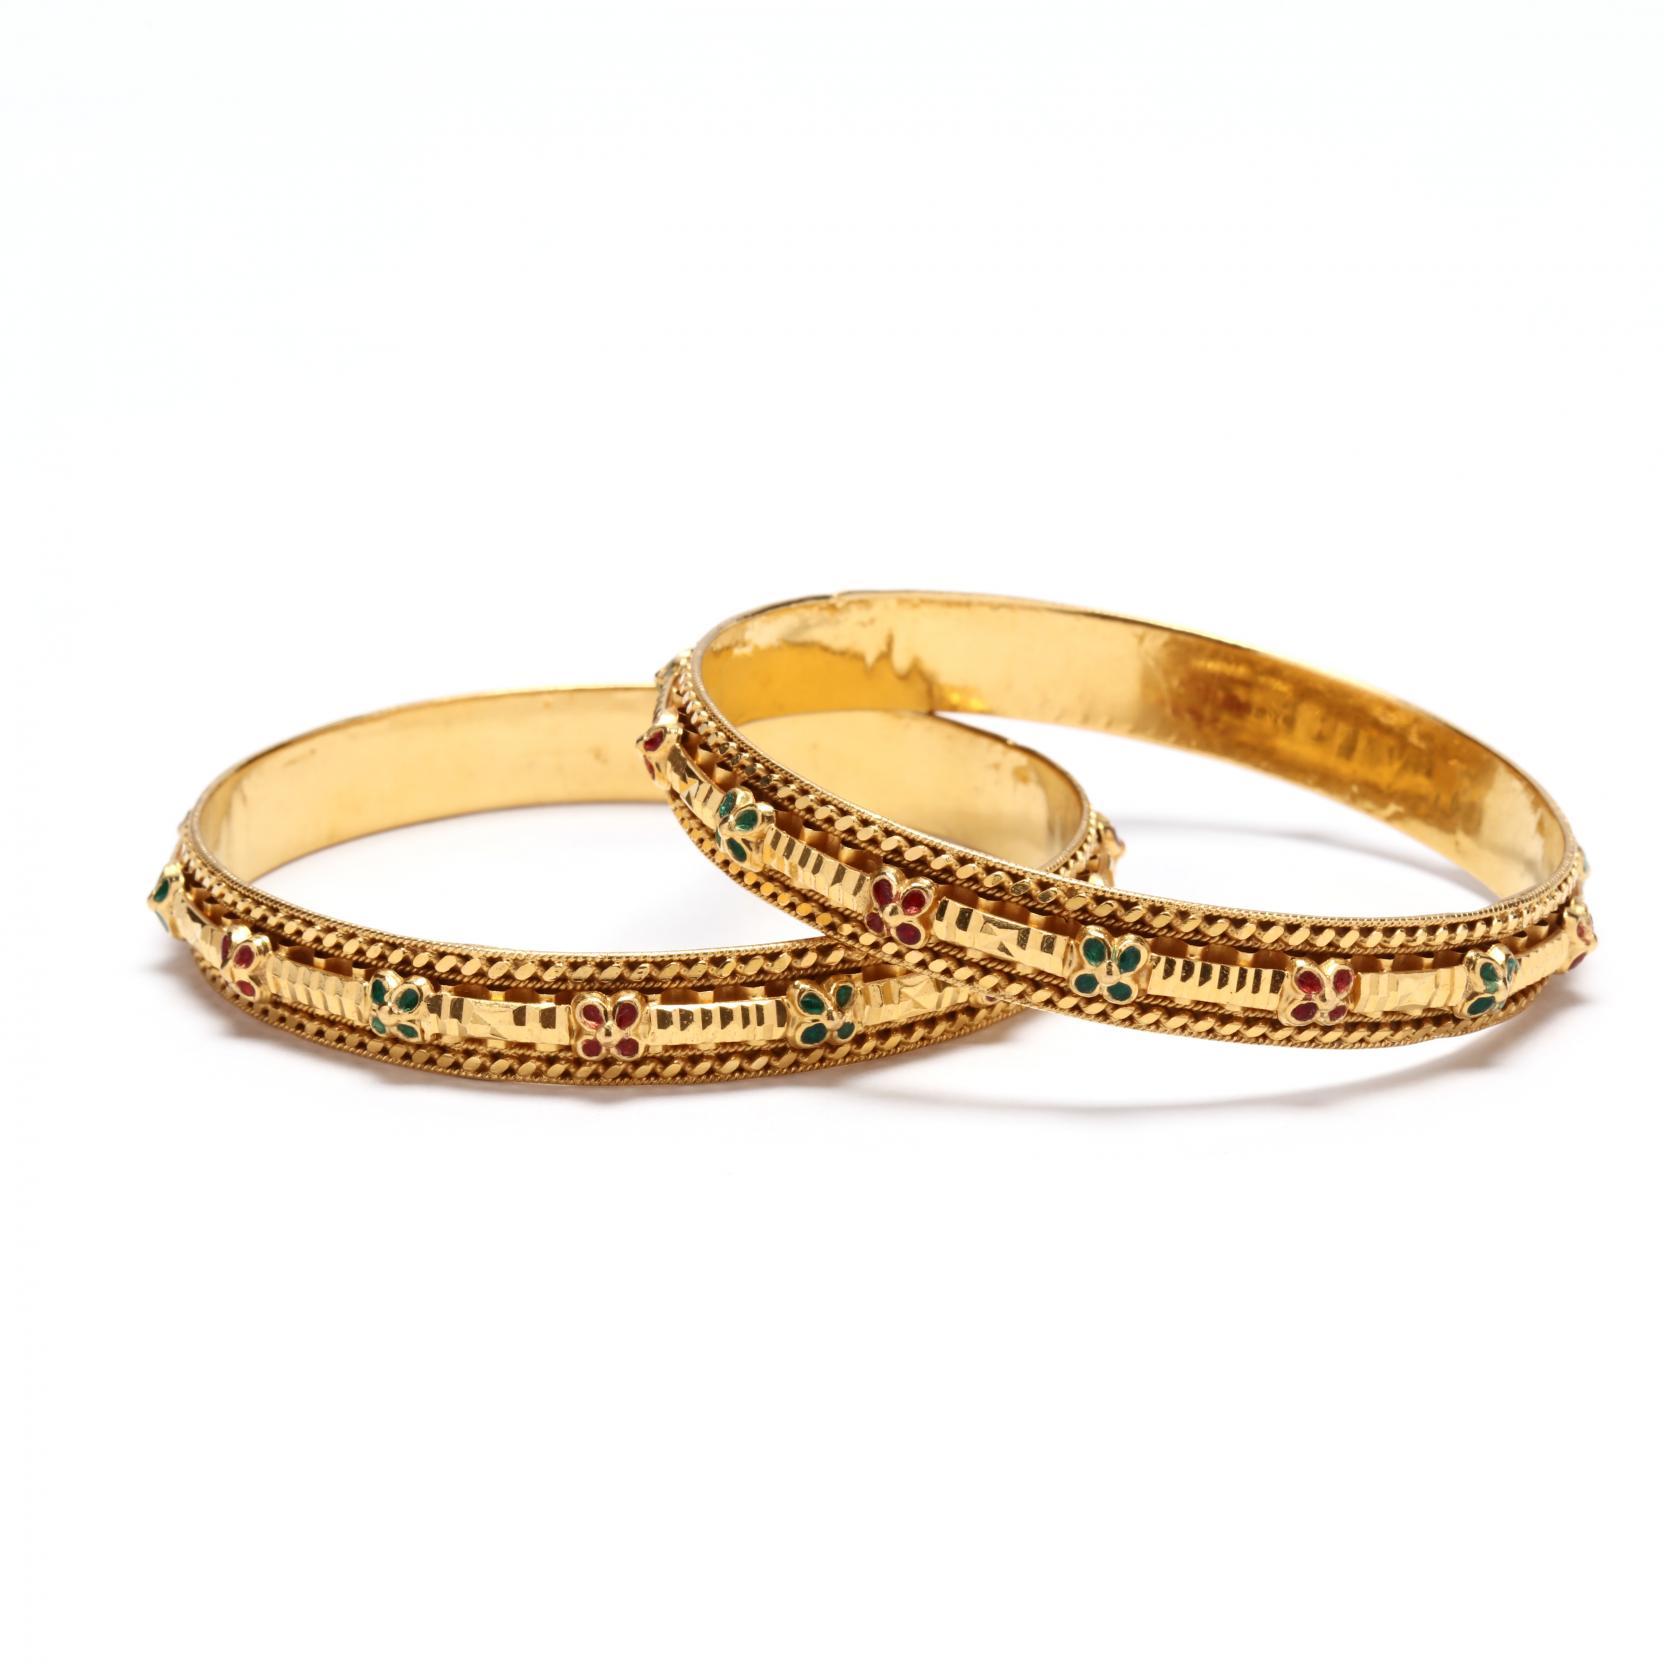 pair-of-high-karat-gold-and-enamel-bangle-bracelets